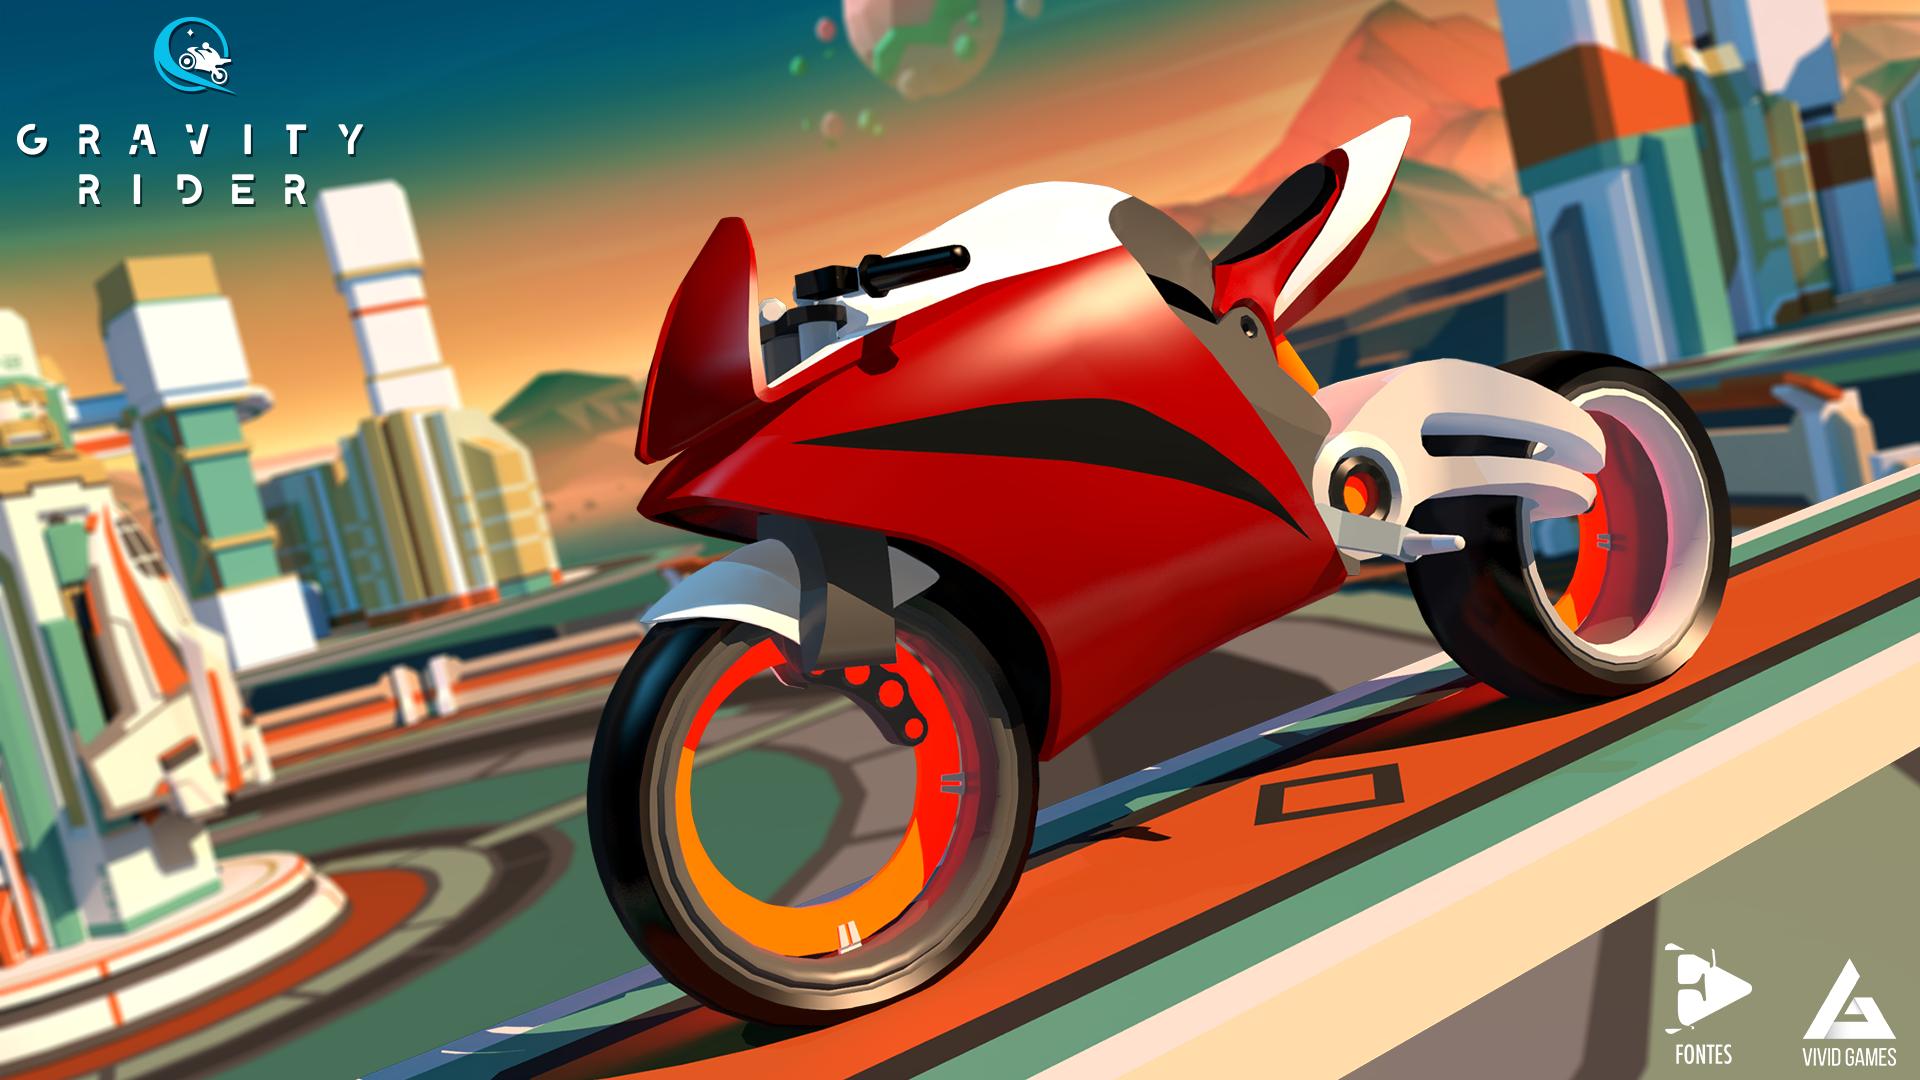 Gravity Rider   Mobile game   Vivid Games   App Store